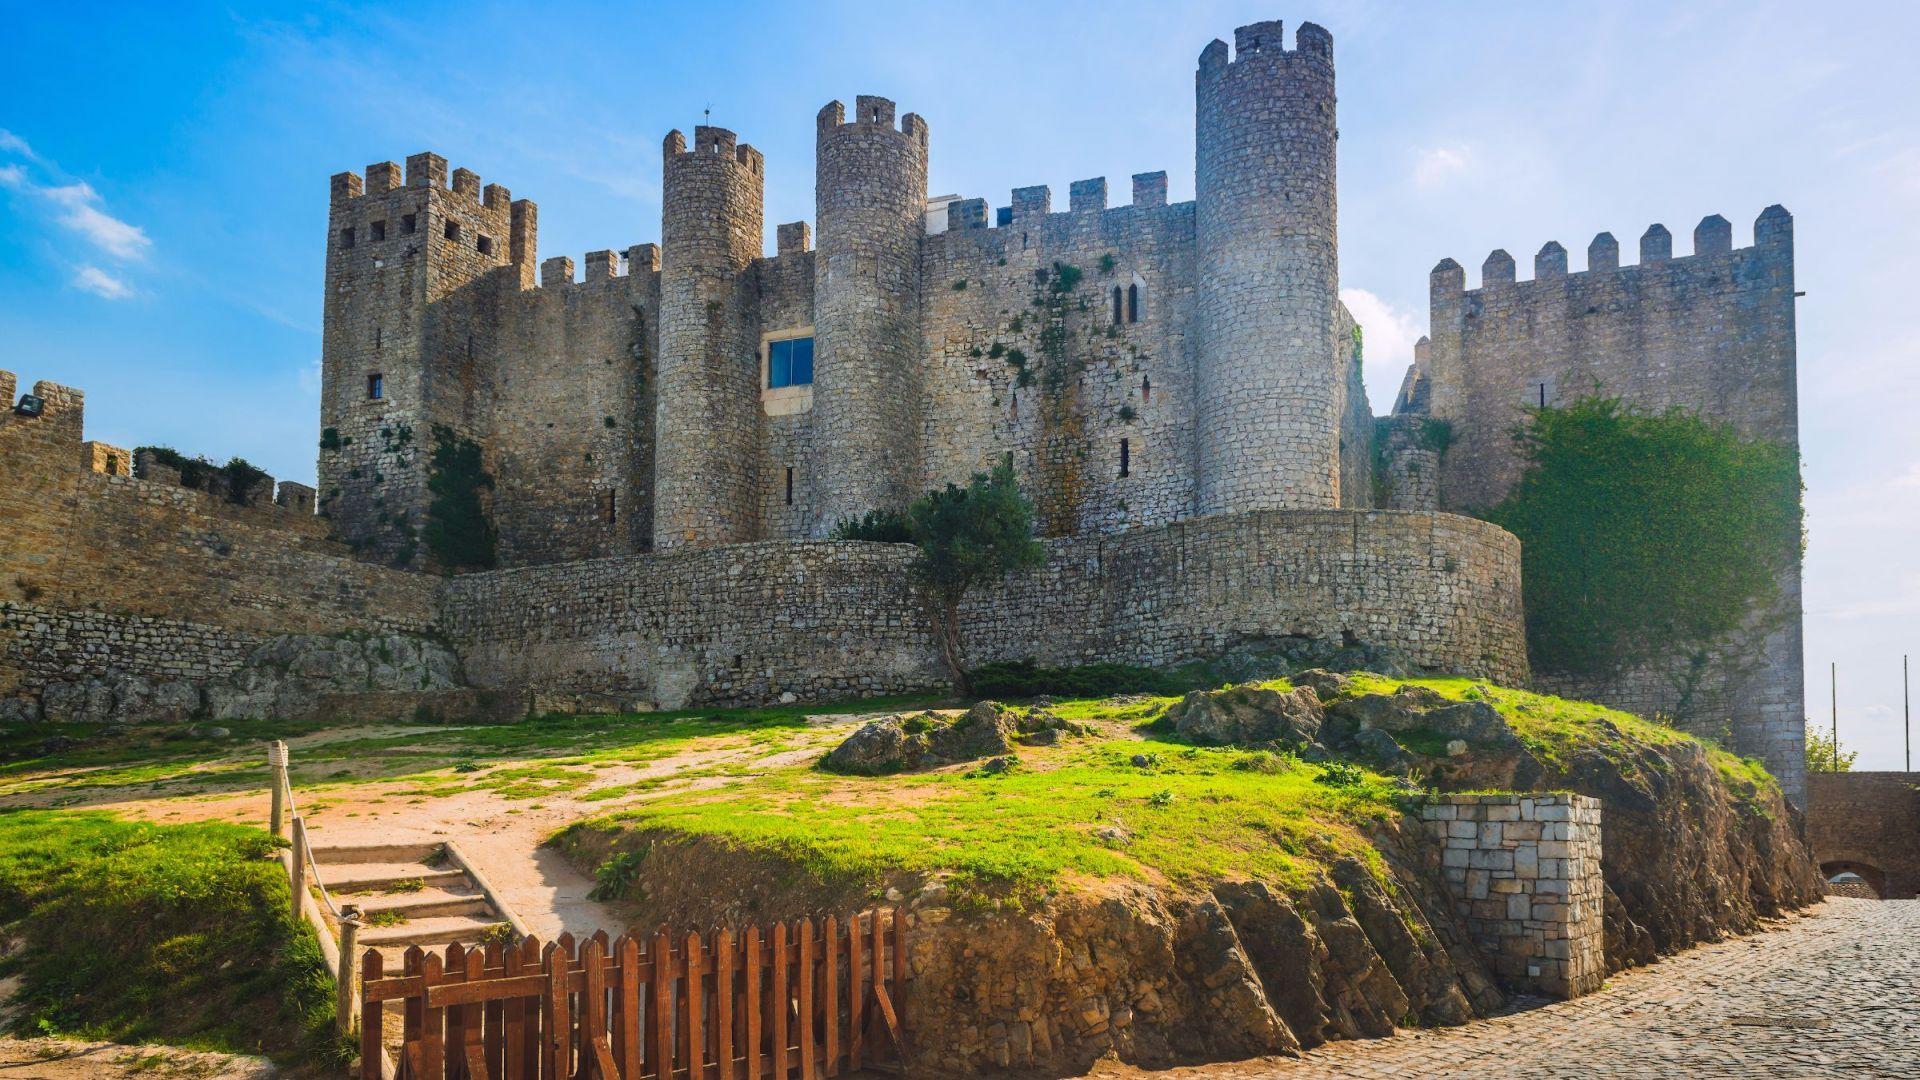 Het kasteel van Óbidos - Pousada Castelo de Óbidos